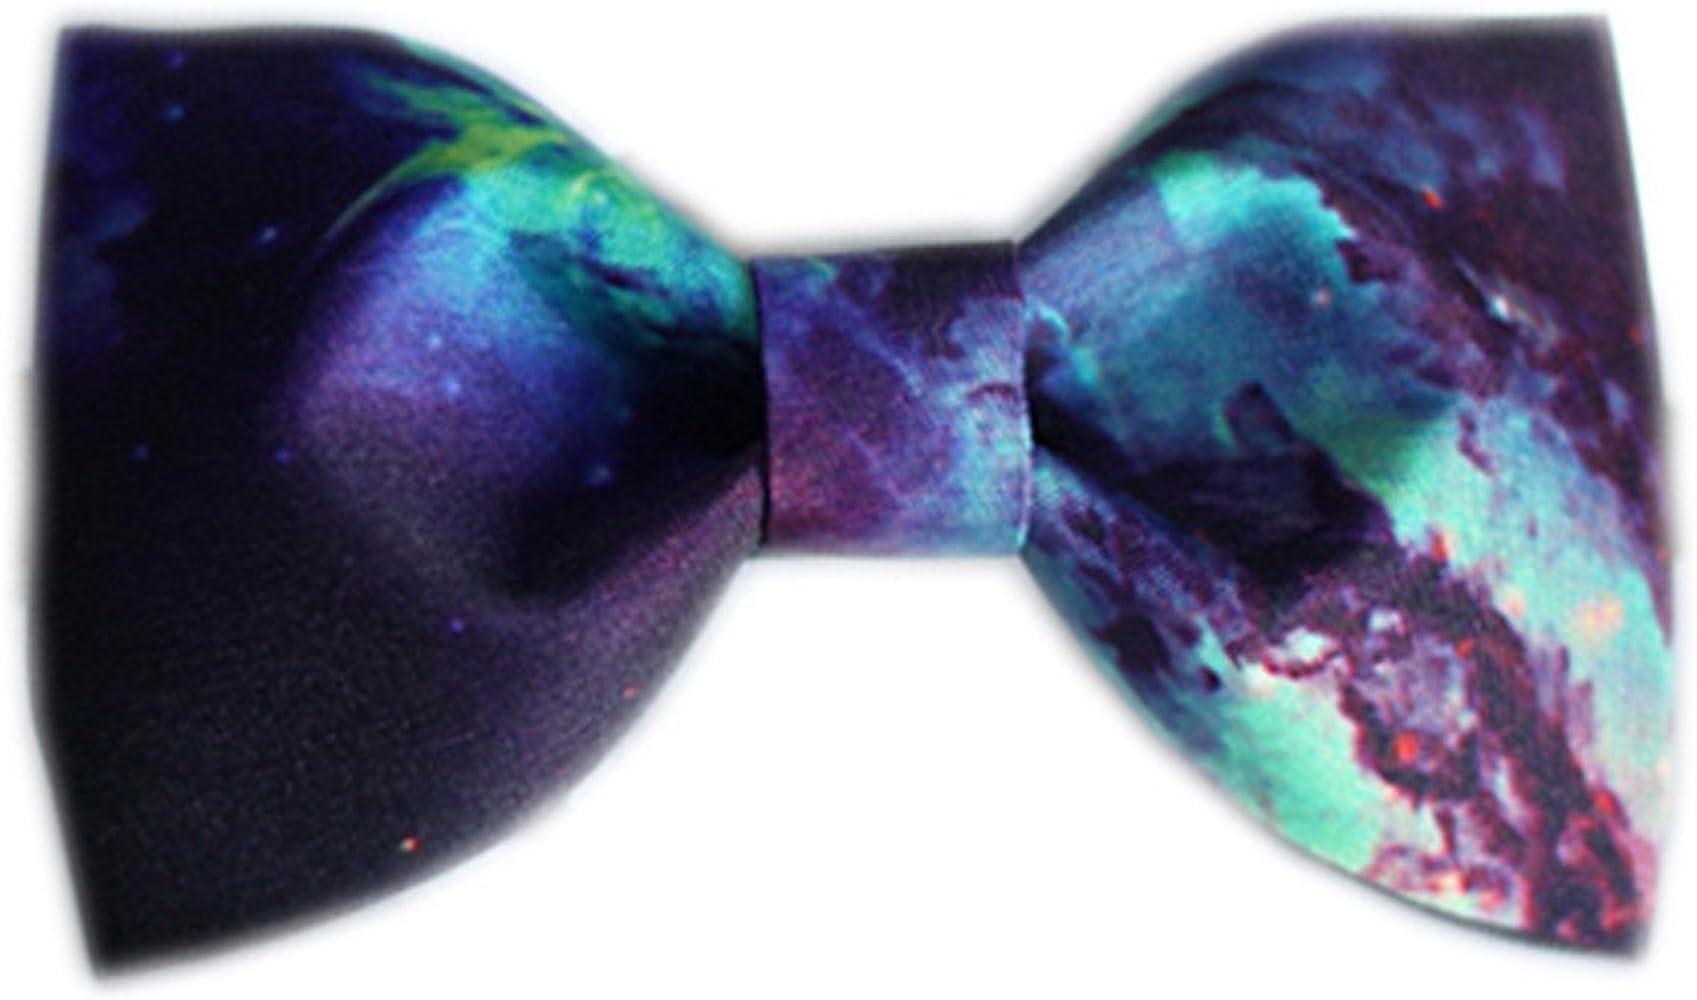 Dise?o De Corbata Nebulosa Estampados Textiles Pajarita (Tinta ...